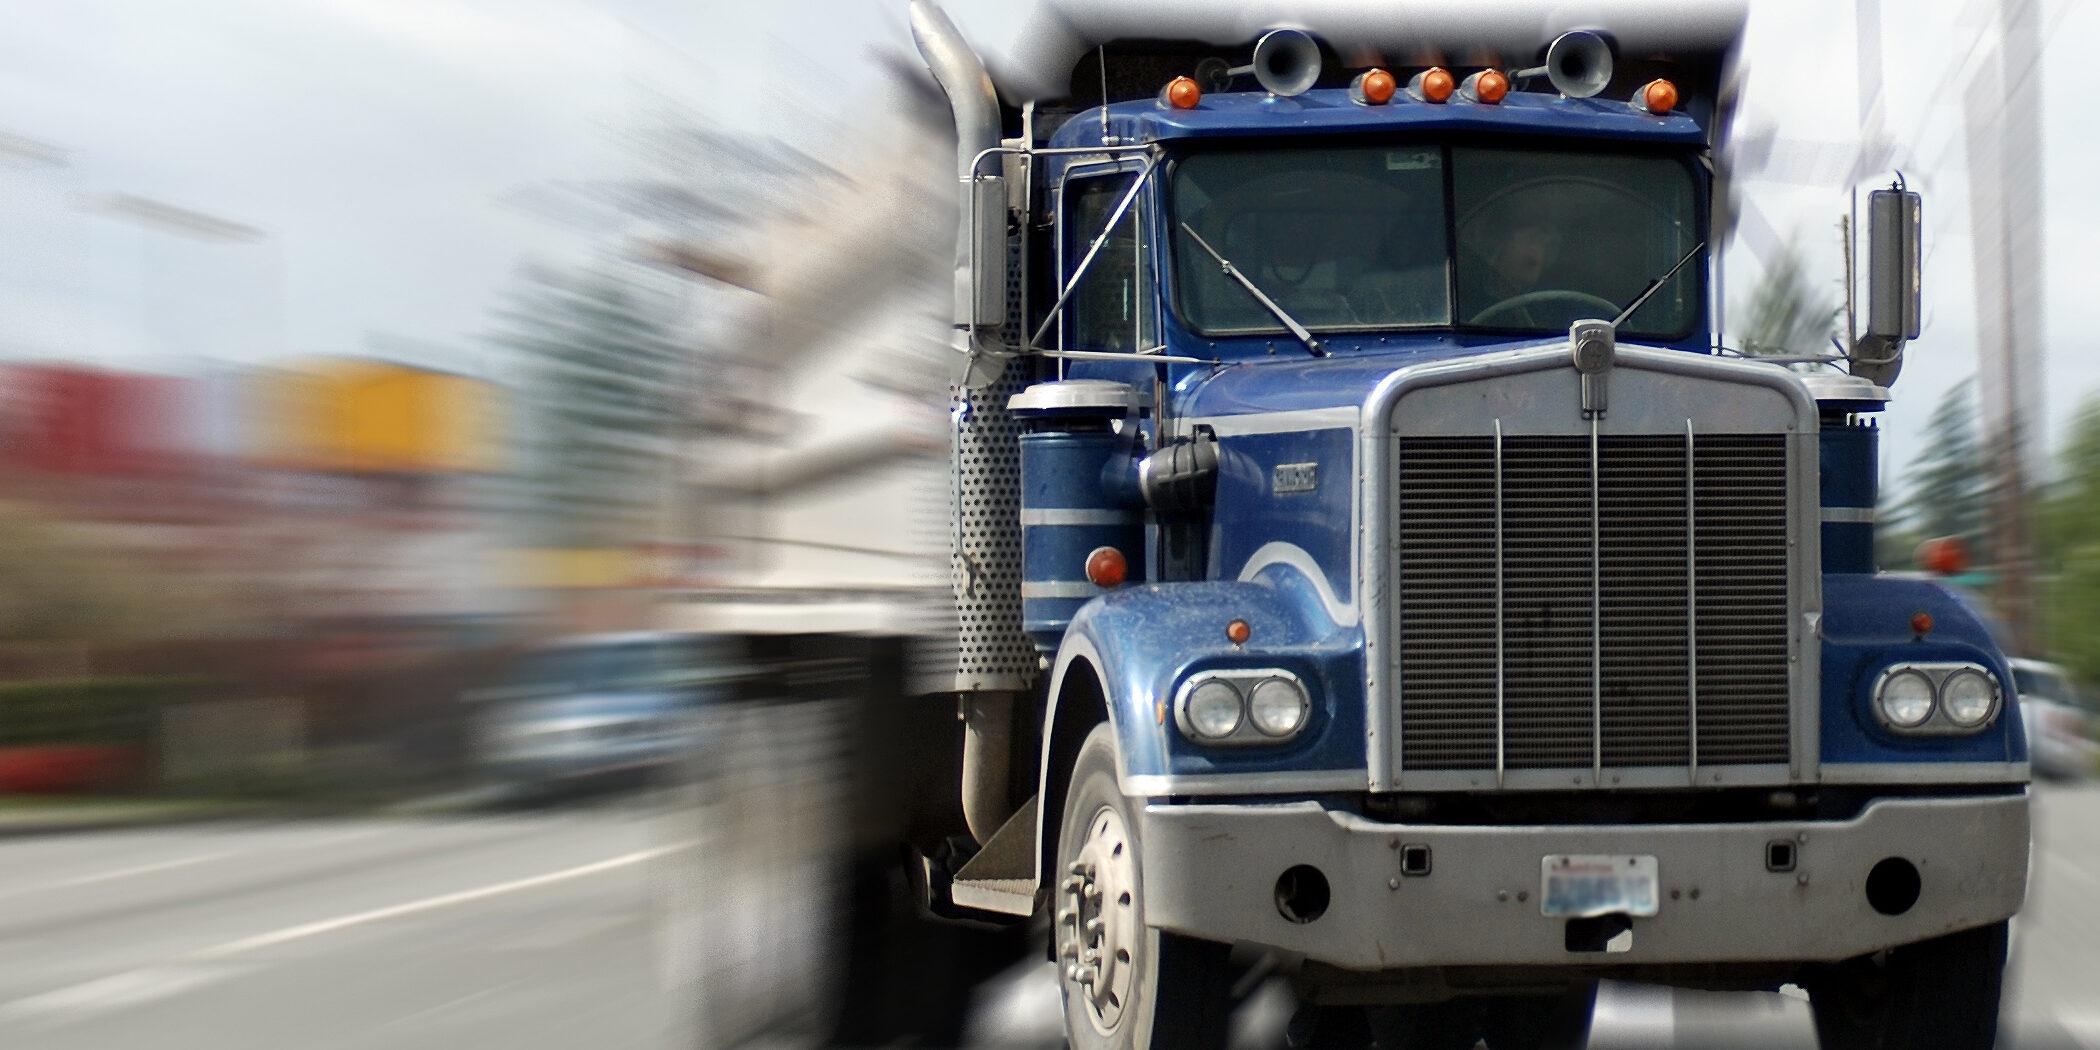 Lexington Truck Accident Lawyers